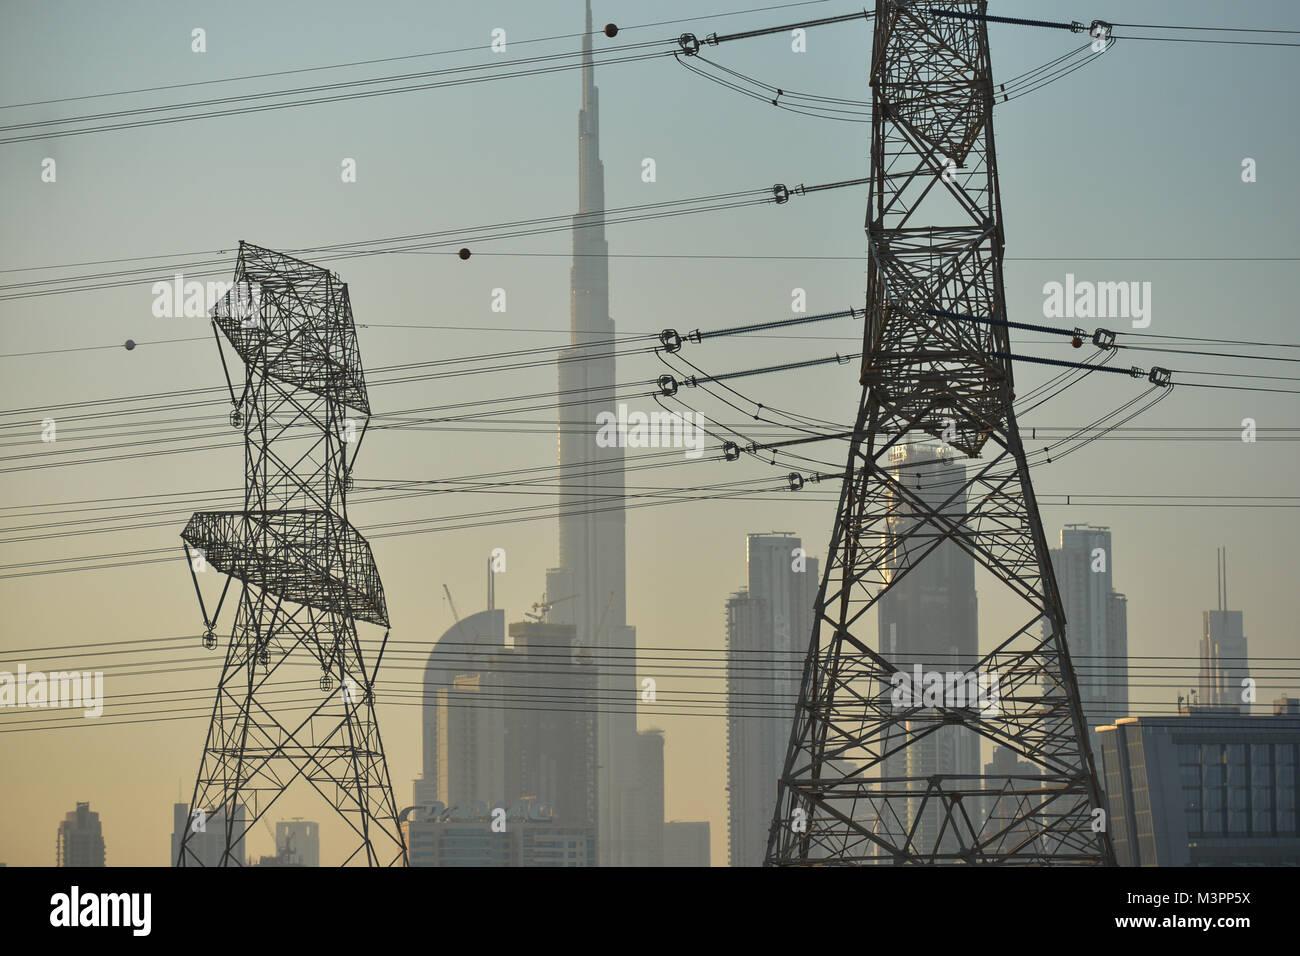 DUBAI, UAE - FEBRUARY 11, 2018. A view of Burg Khalifa and Dubaicenter seen  trough the electric wires network alongside of a motorway near Dubai.